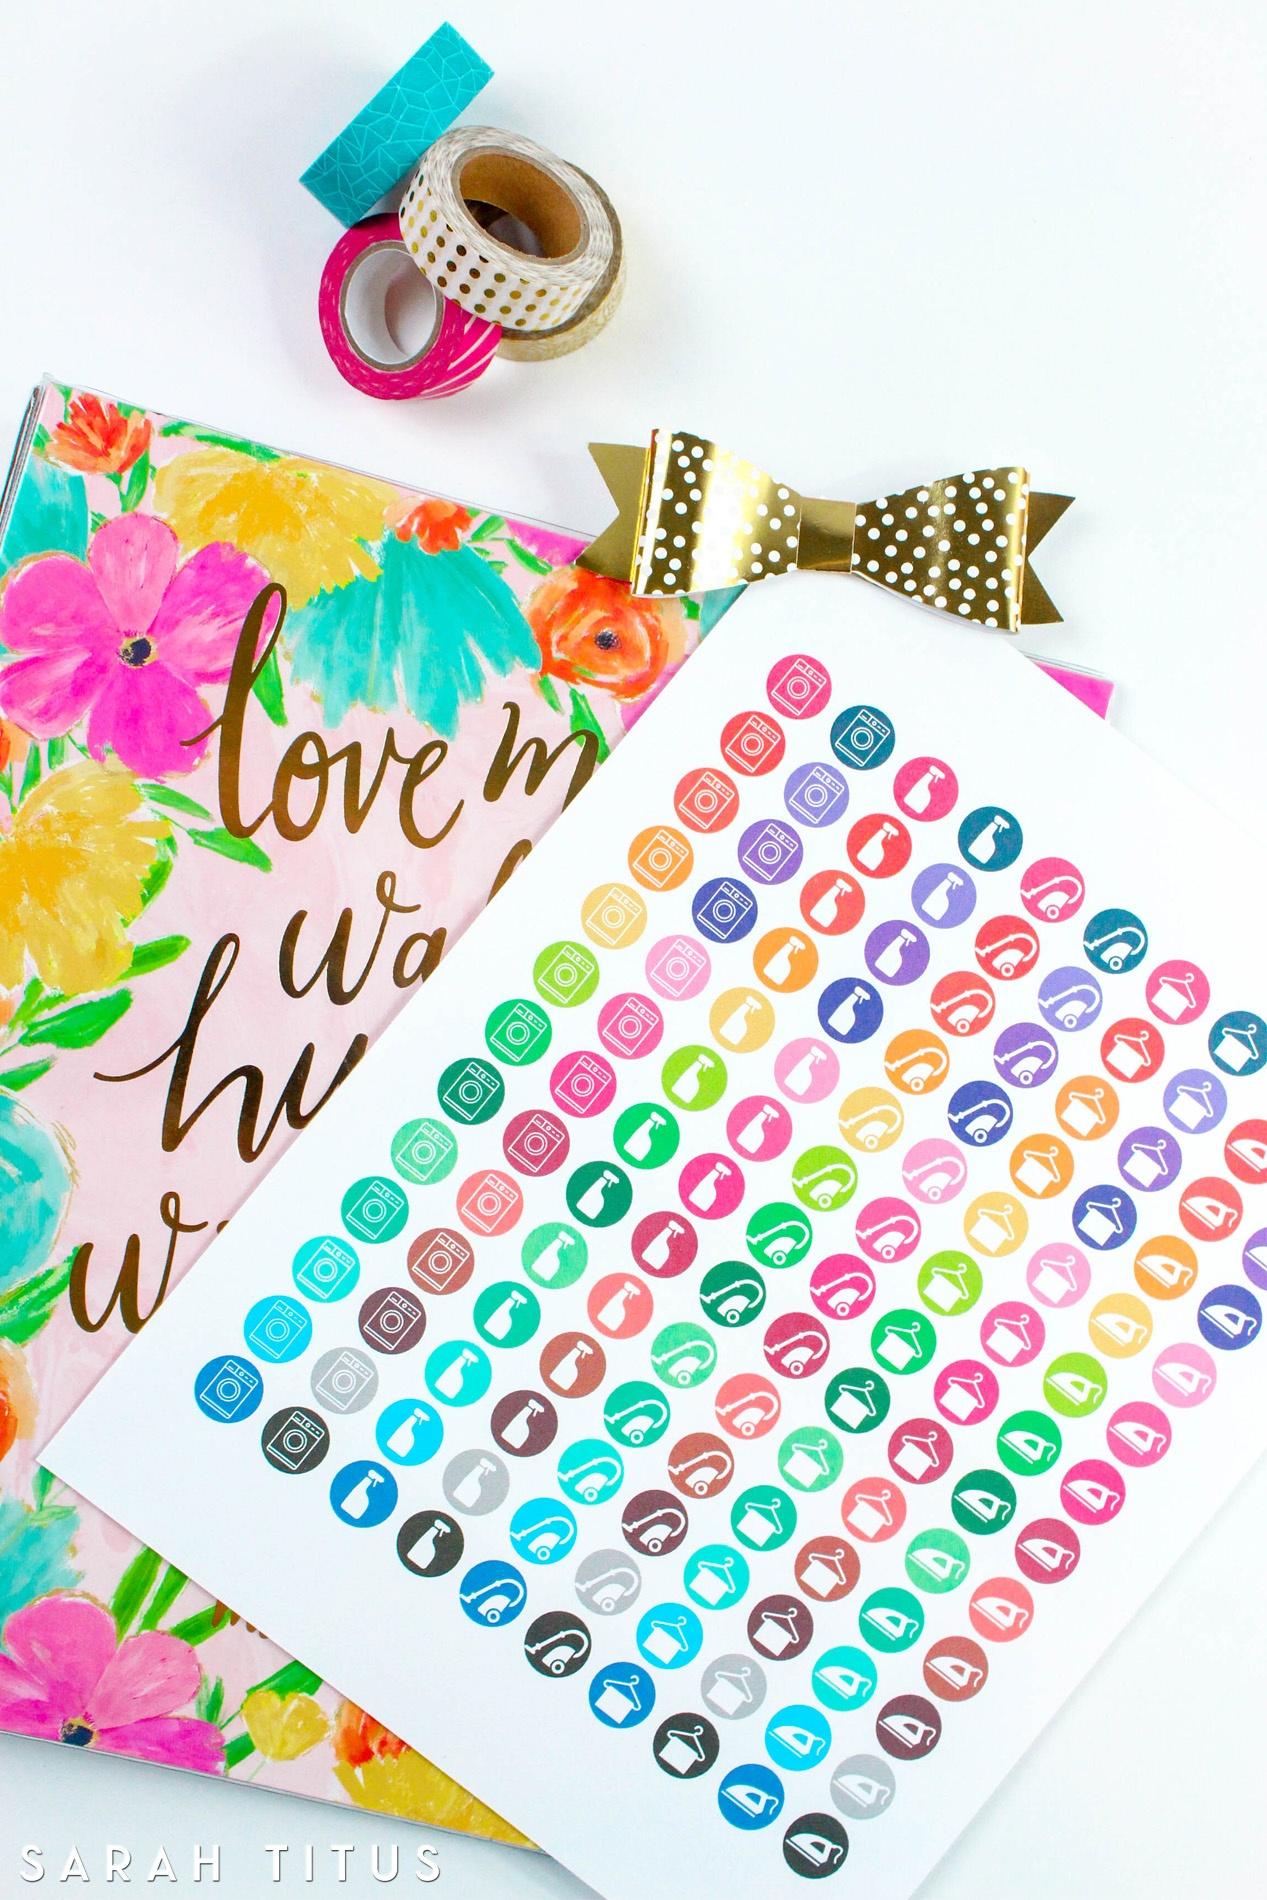 Free Printable Cleaning Stickers - Sarah Titus - Chore Stickers Free Printable